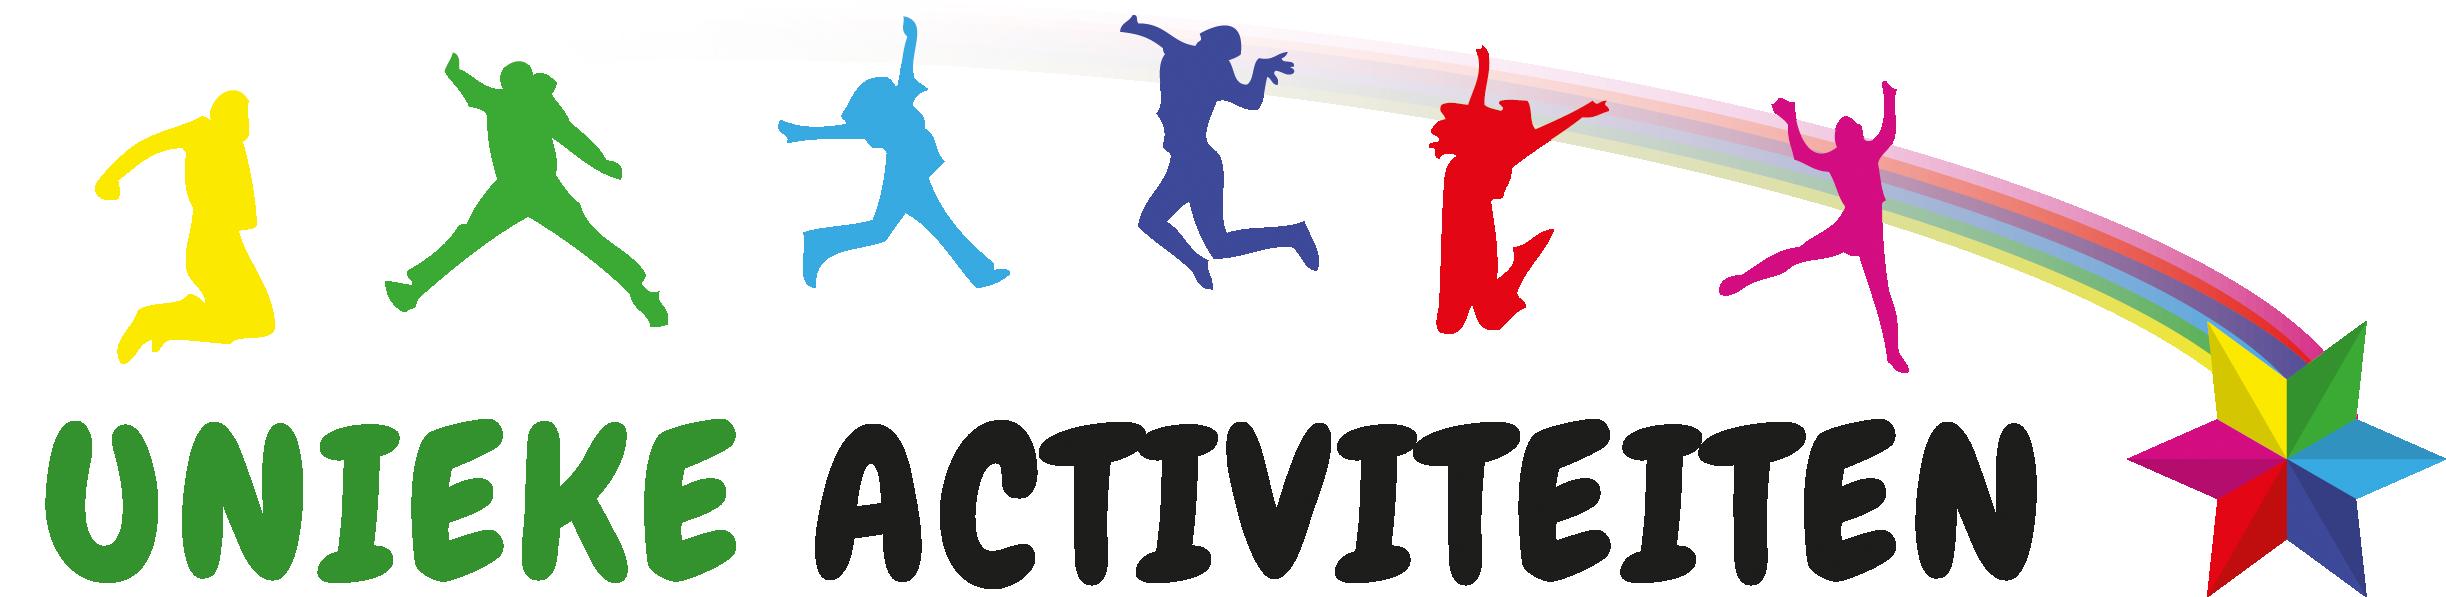 Logo Unieke Activiteiten nieuw transparant